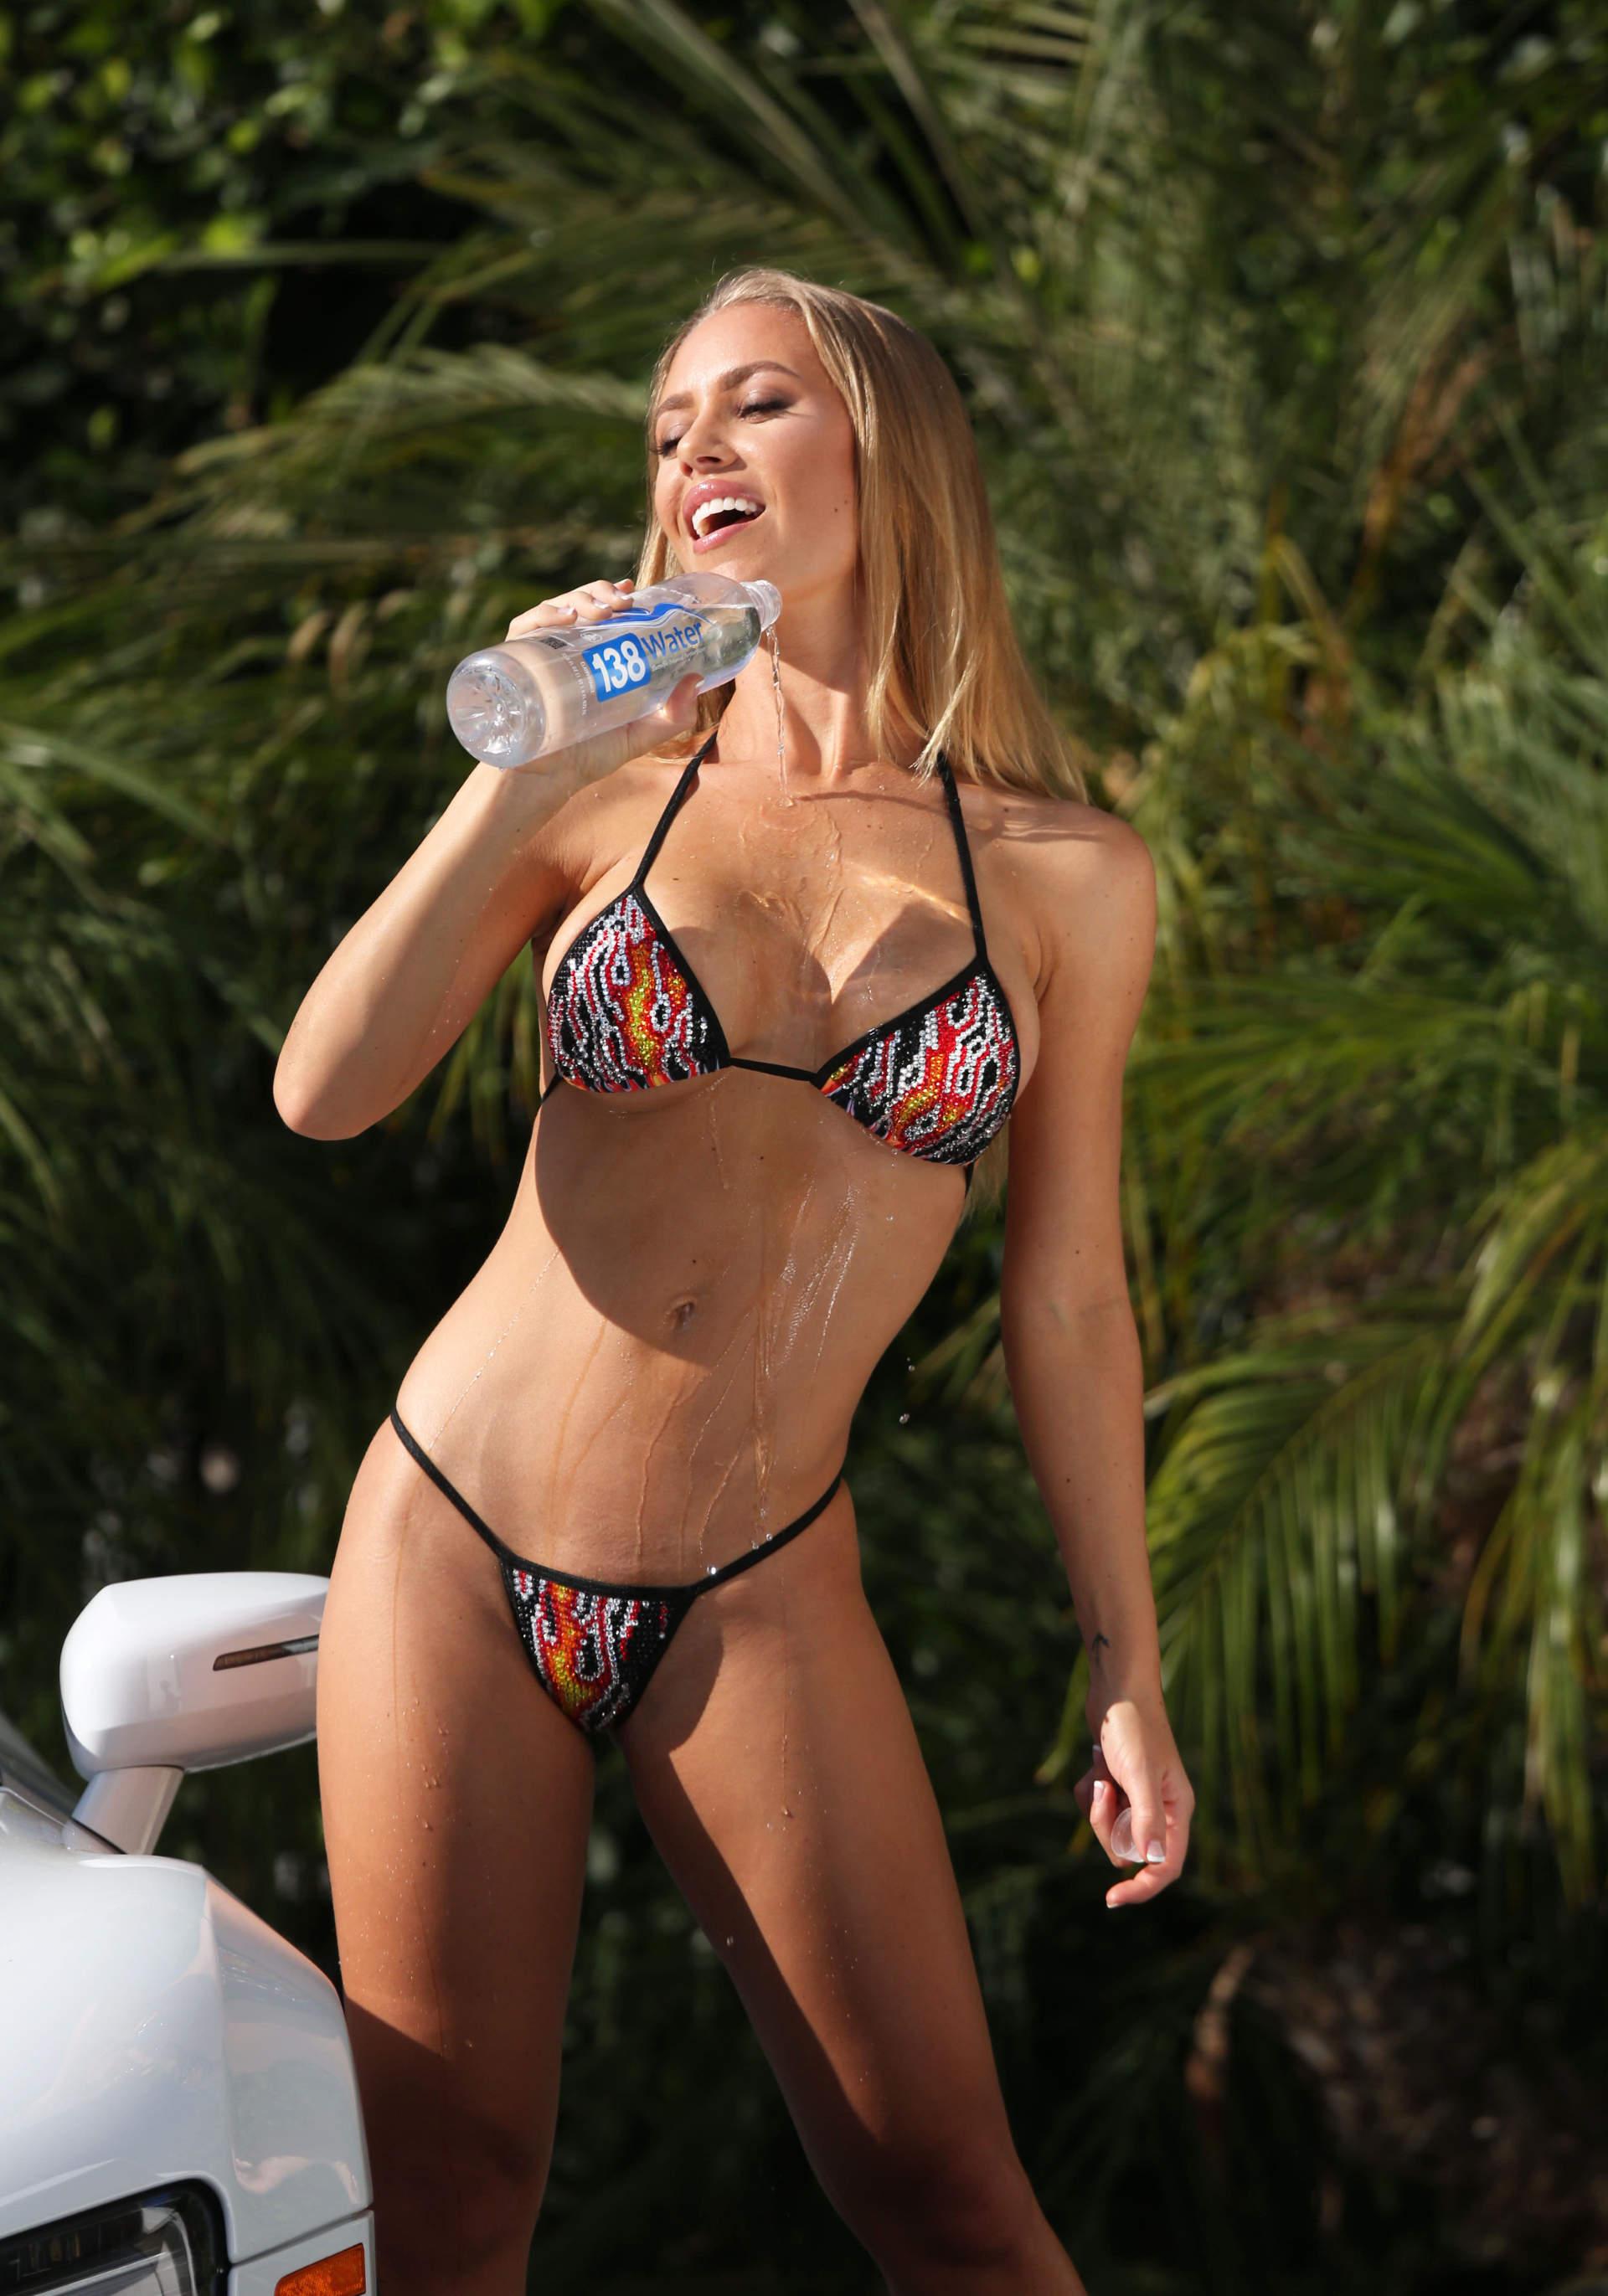 Nicole aniston bikini riot